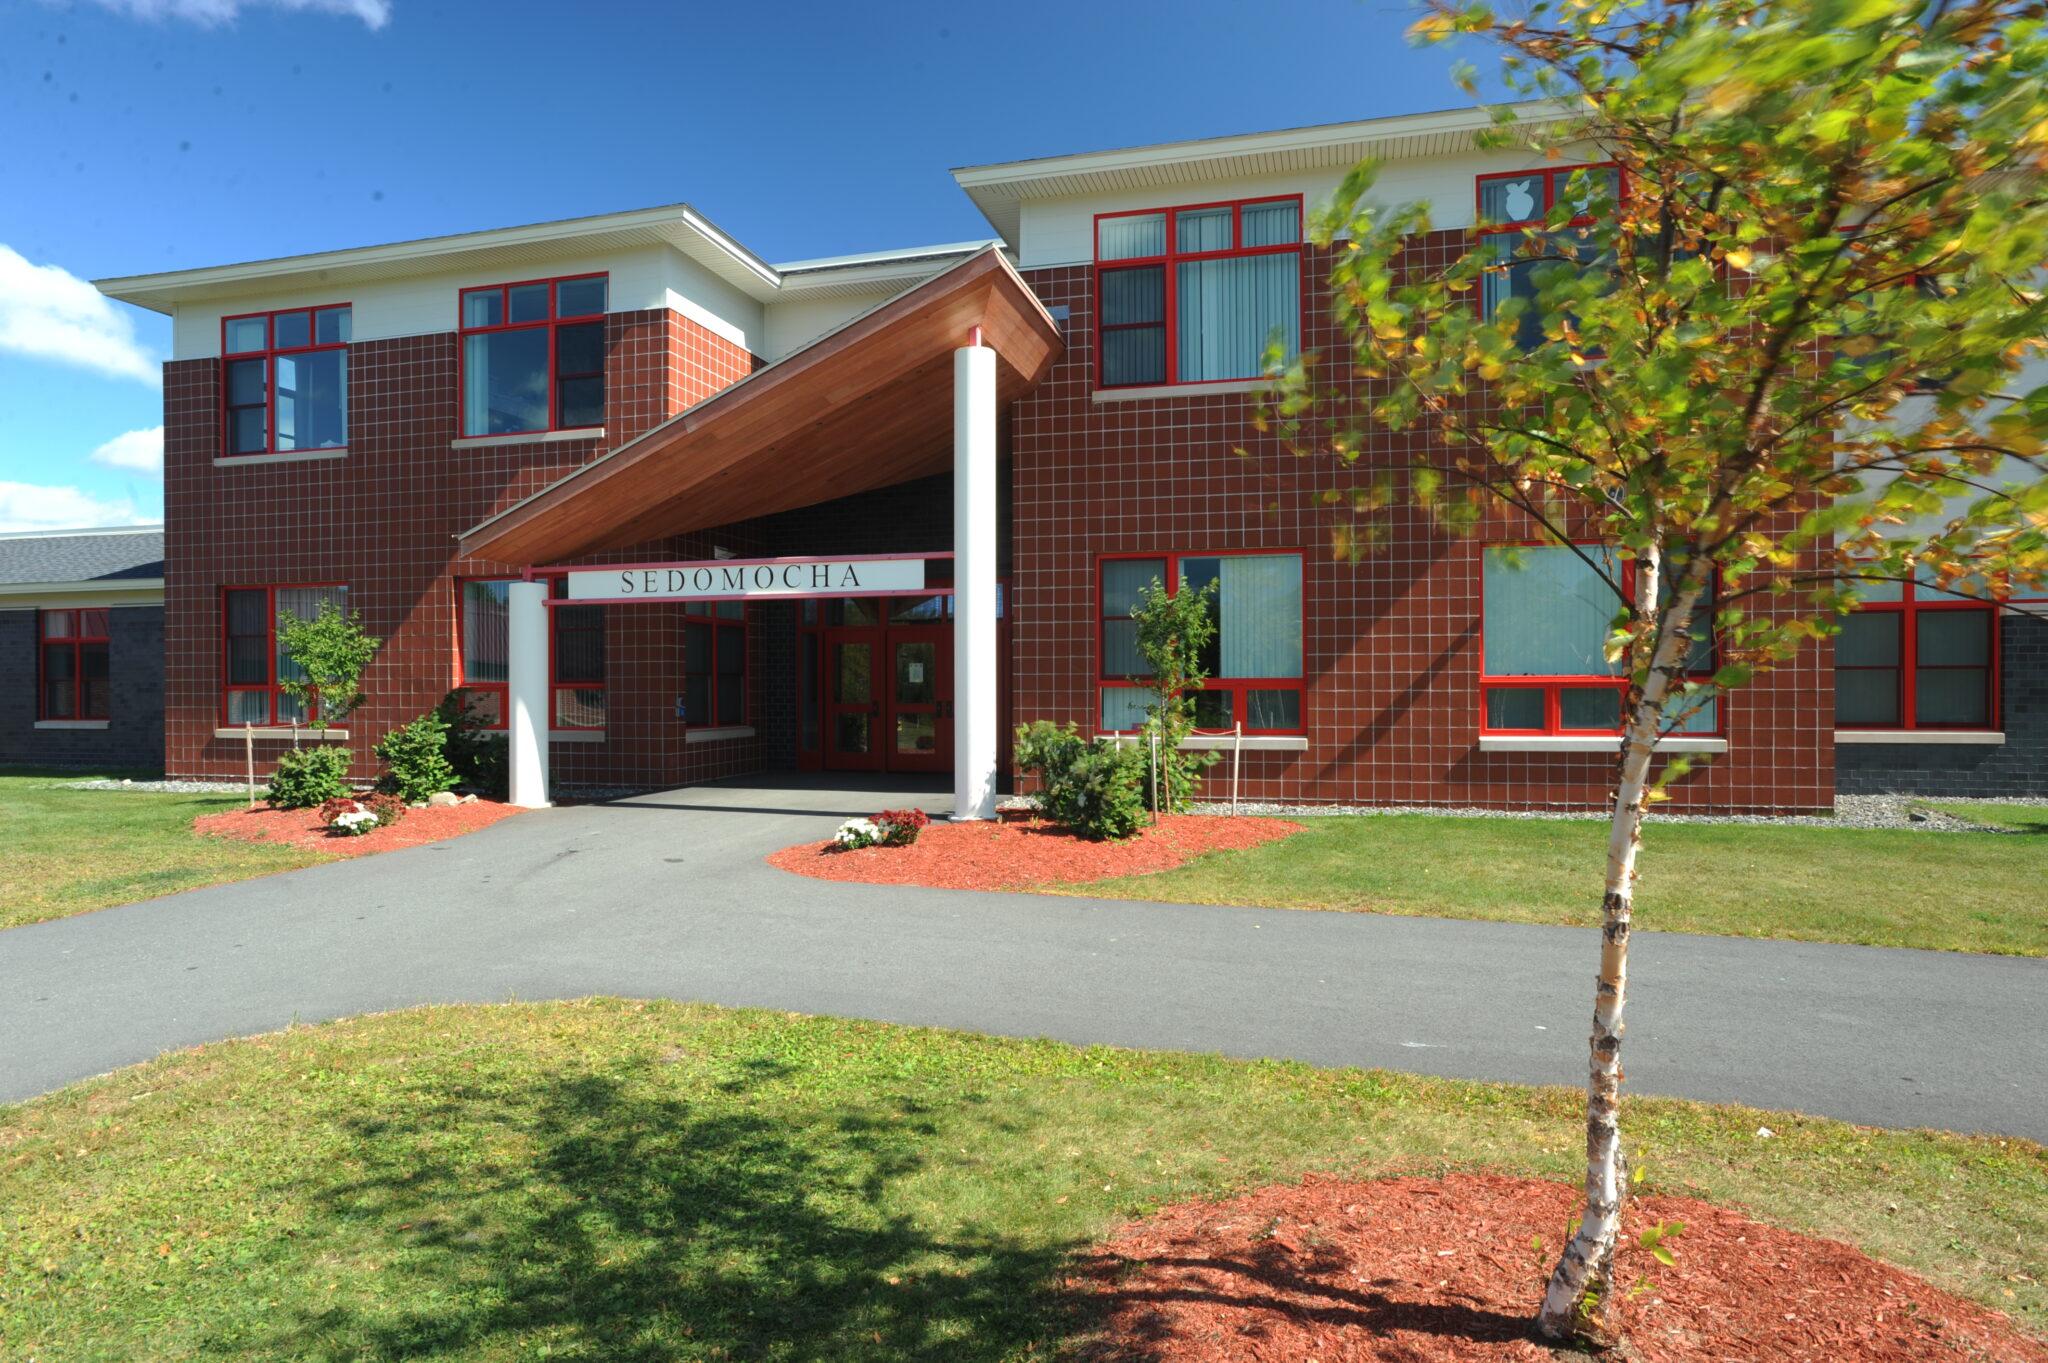 exterior photo of sedomocha elementary school entrance